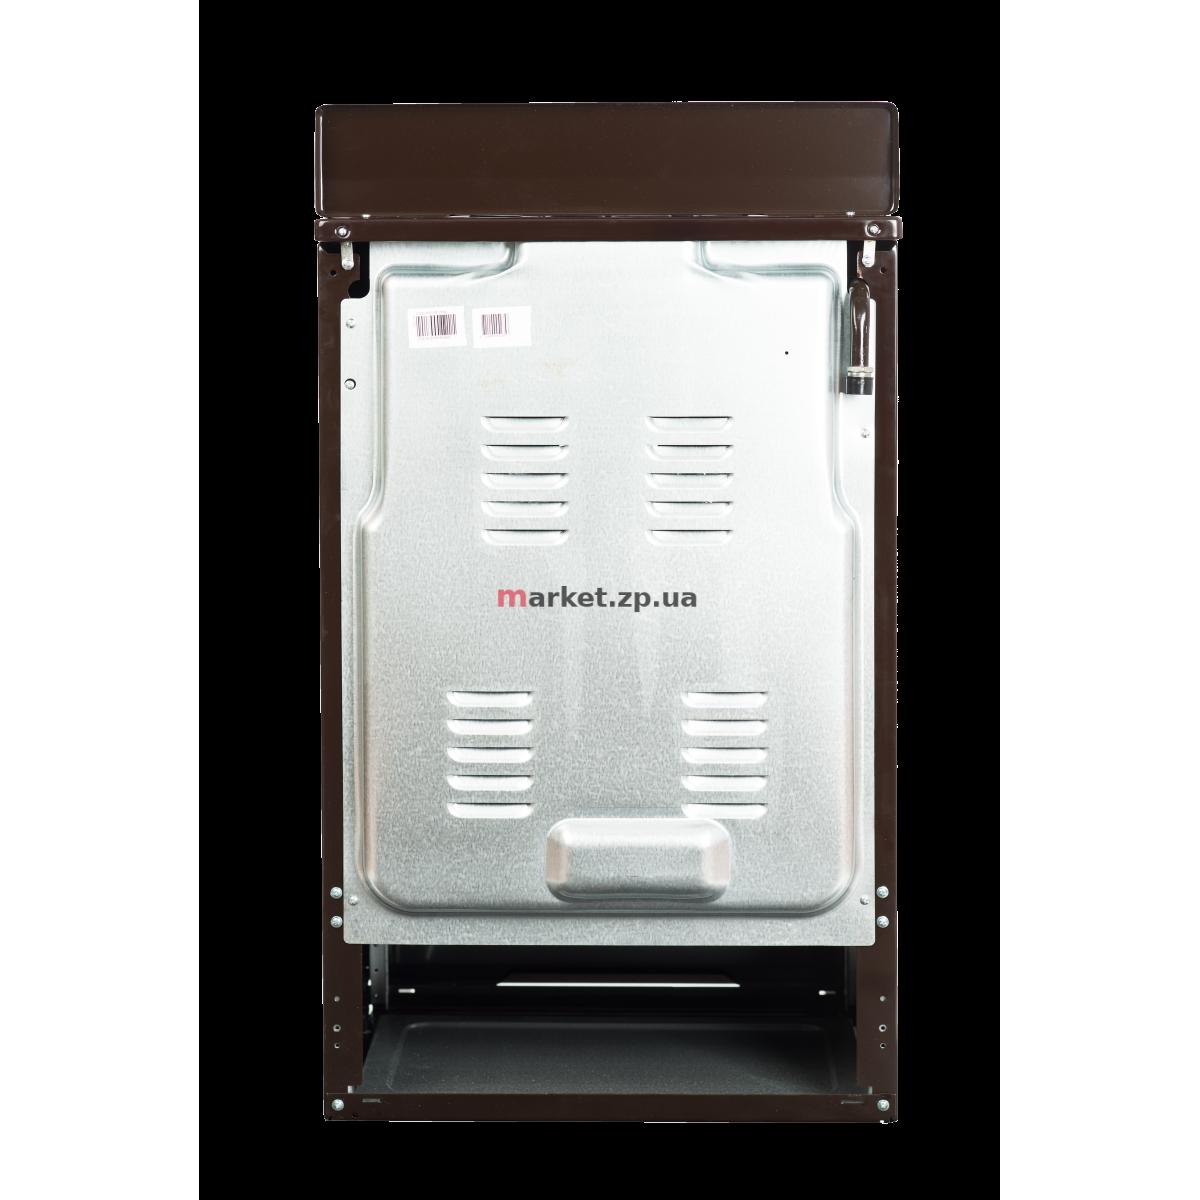 Плита газовая GRETA 1470-17 aa (B) Газ-контроль